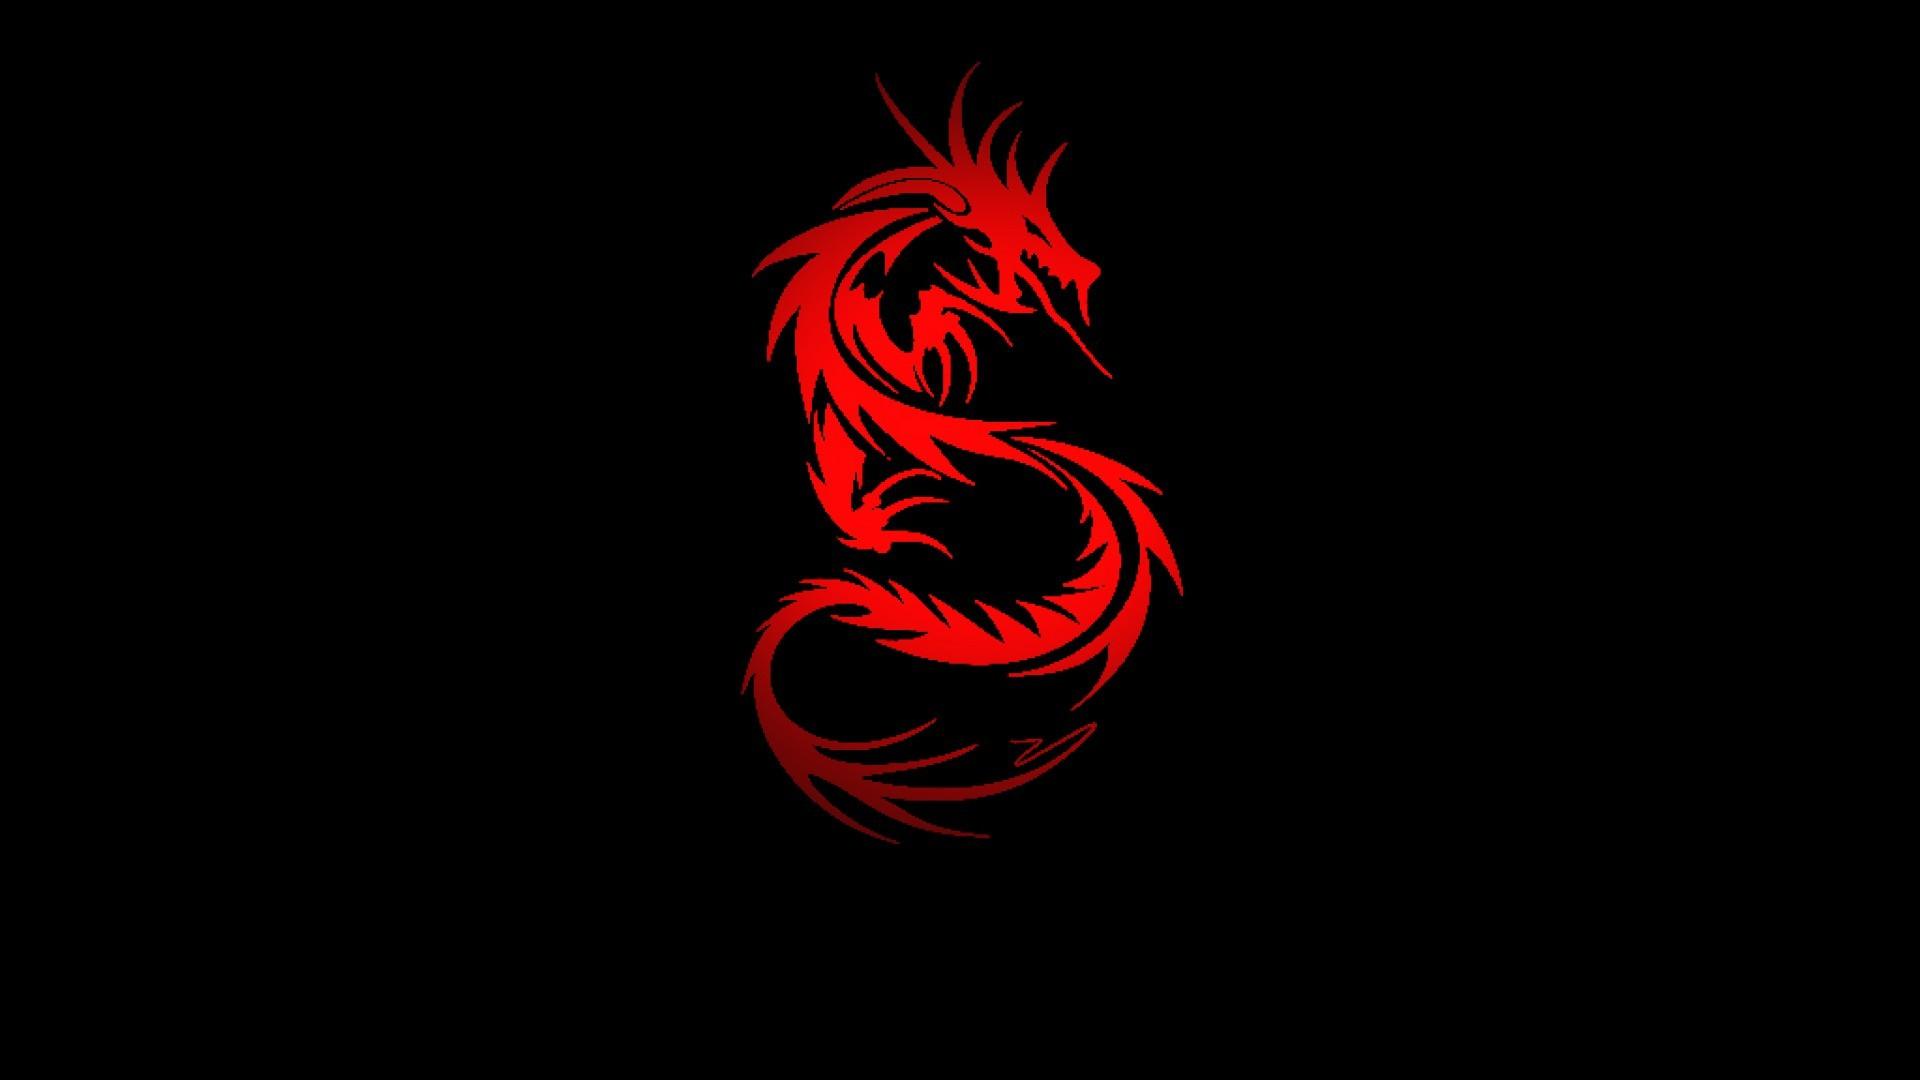 Red Dragon Wallpaper ①